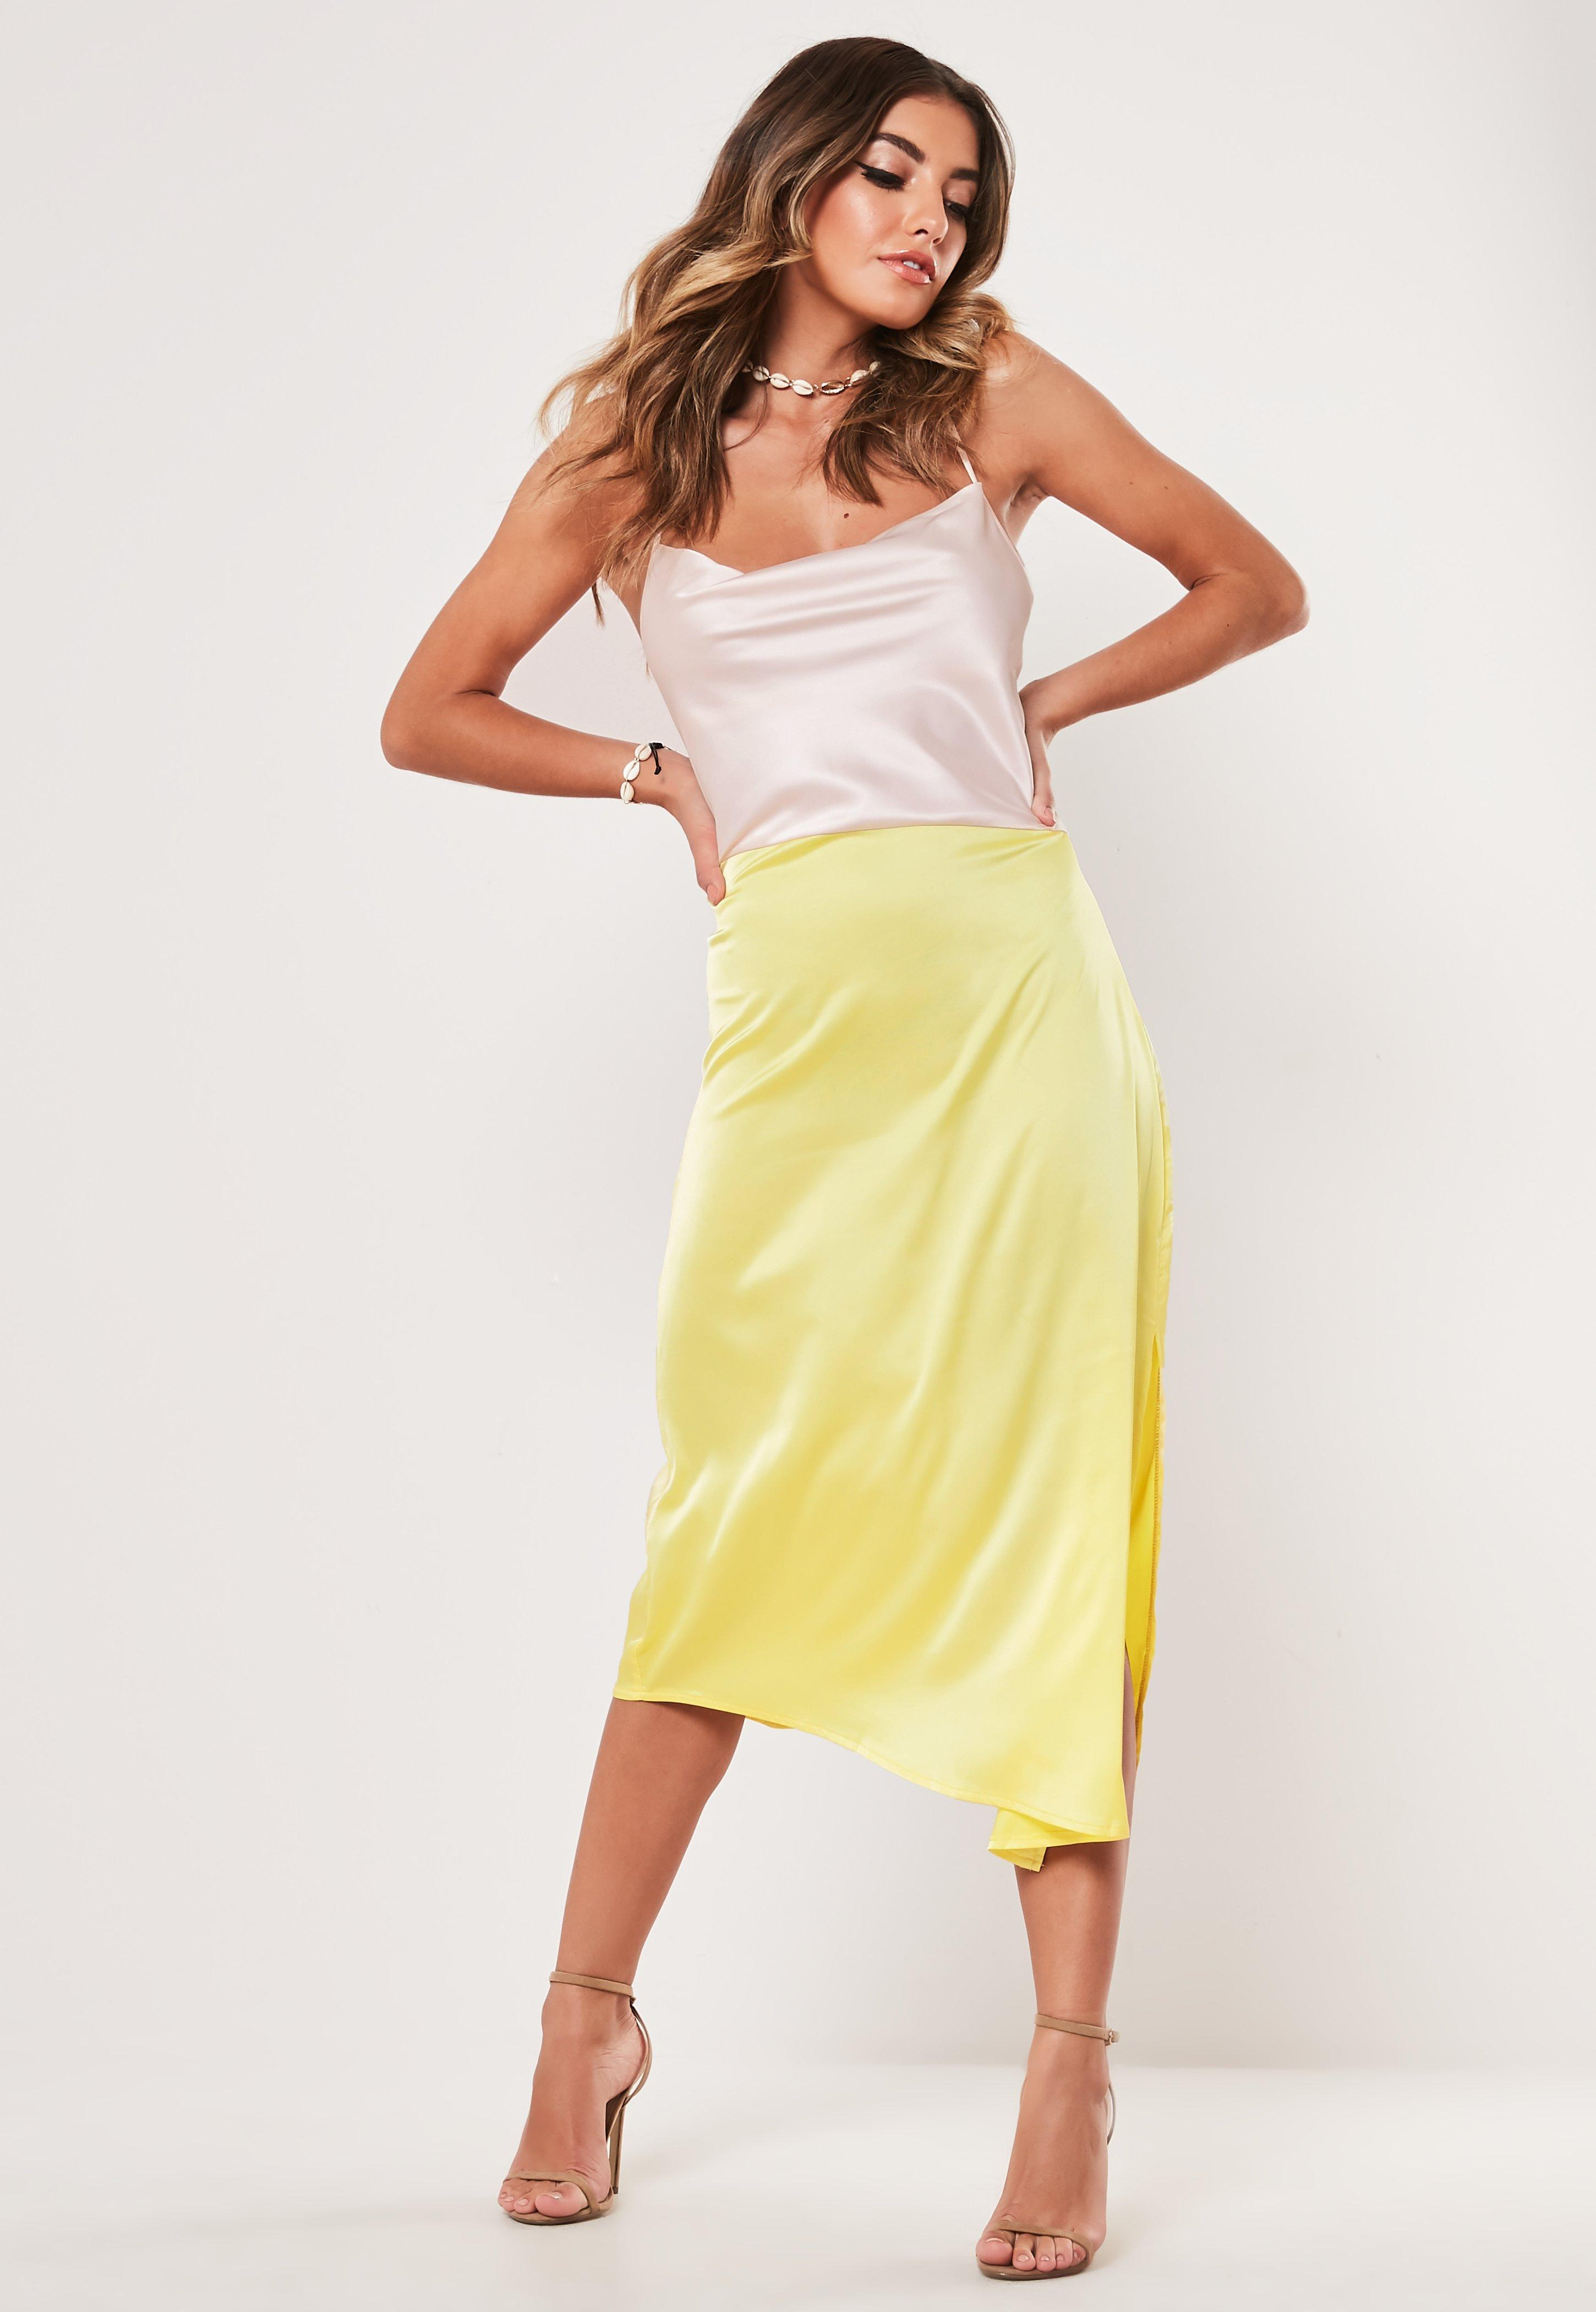 9547792f80 Dresses | Women's Dresses Online - Missguided Australia